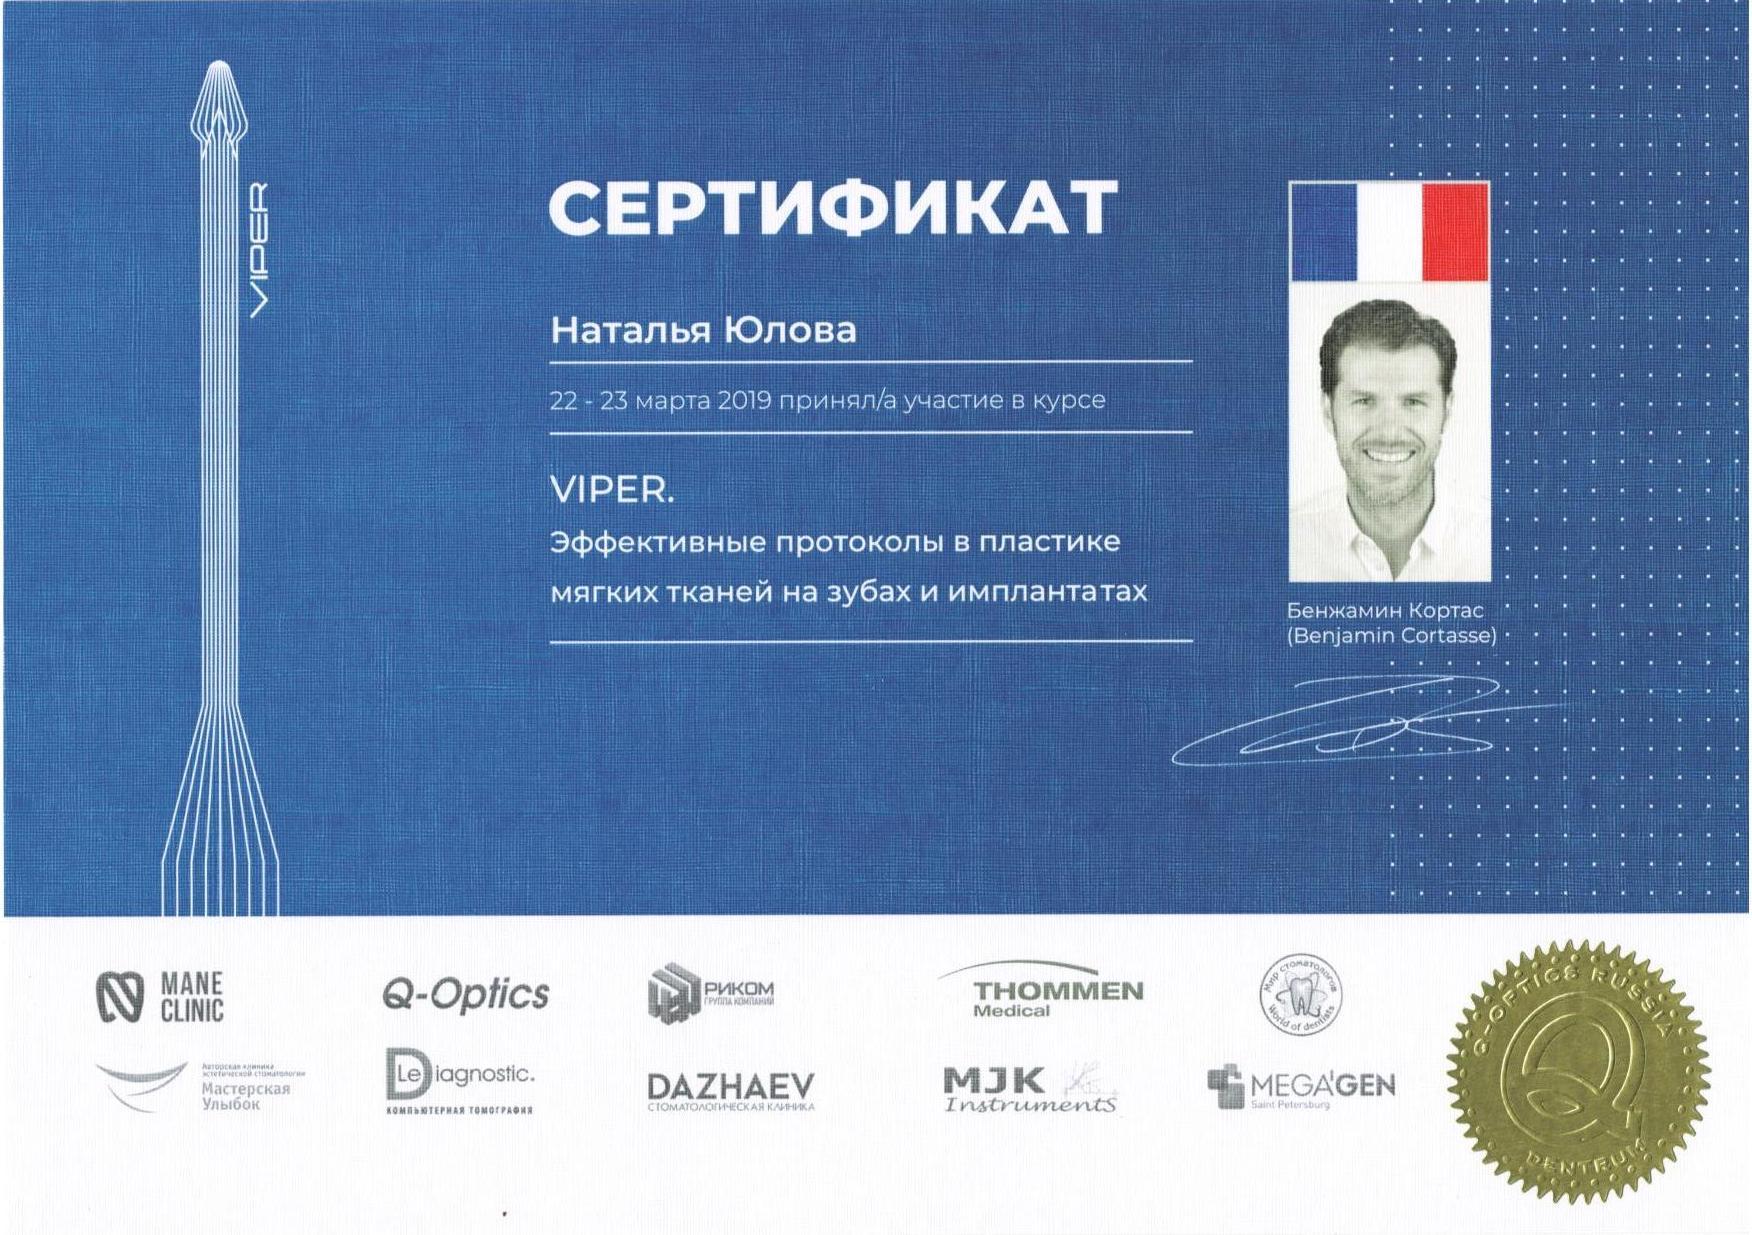 Сертификат Юлова (март 2019)